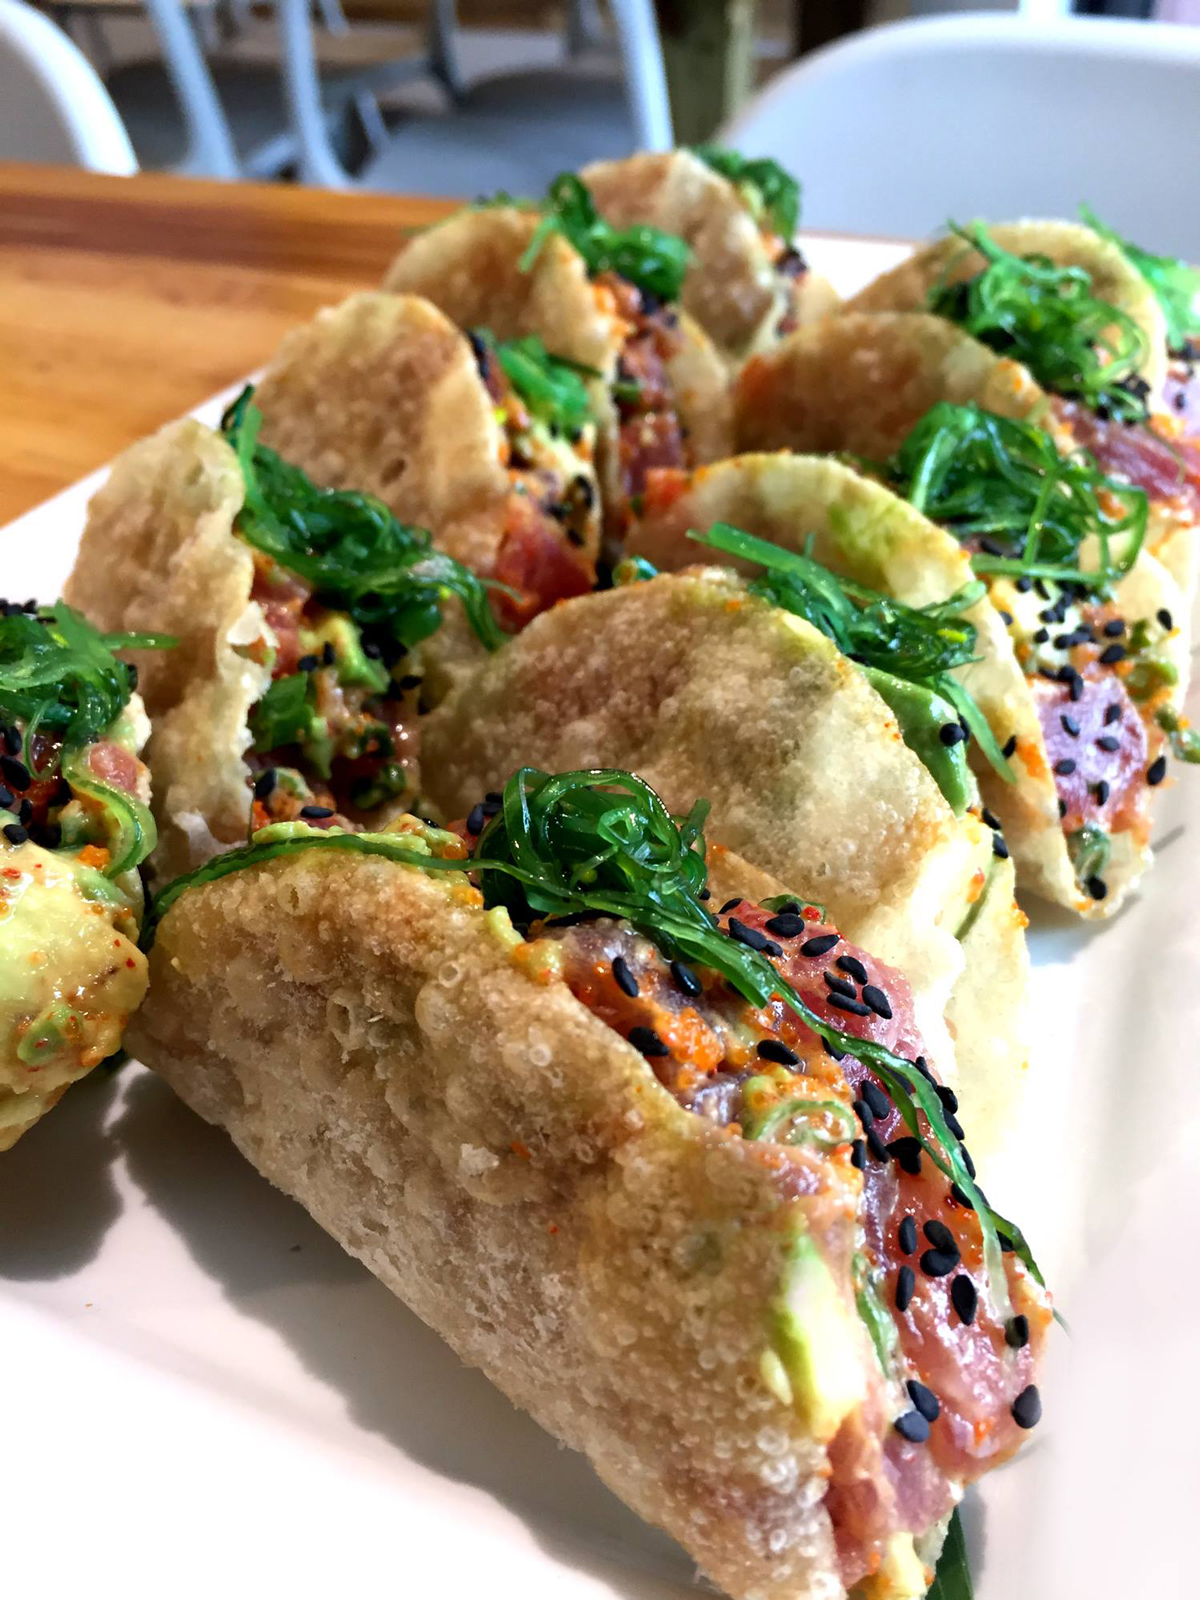 Spicy Ahi Tuna Tacos PokeBao restaurant Coral Gables near Miami, Florida